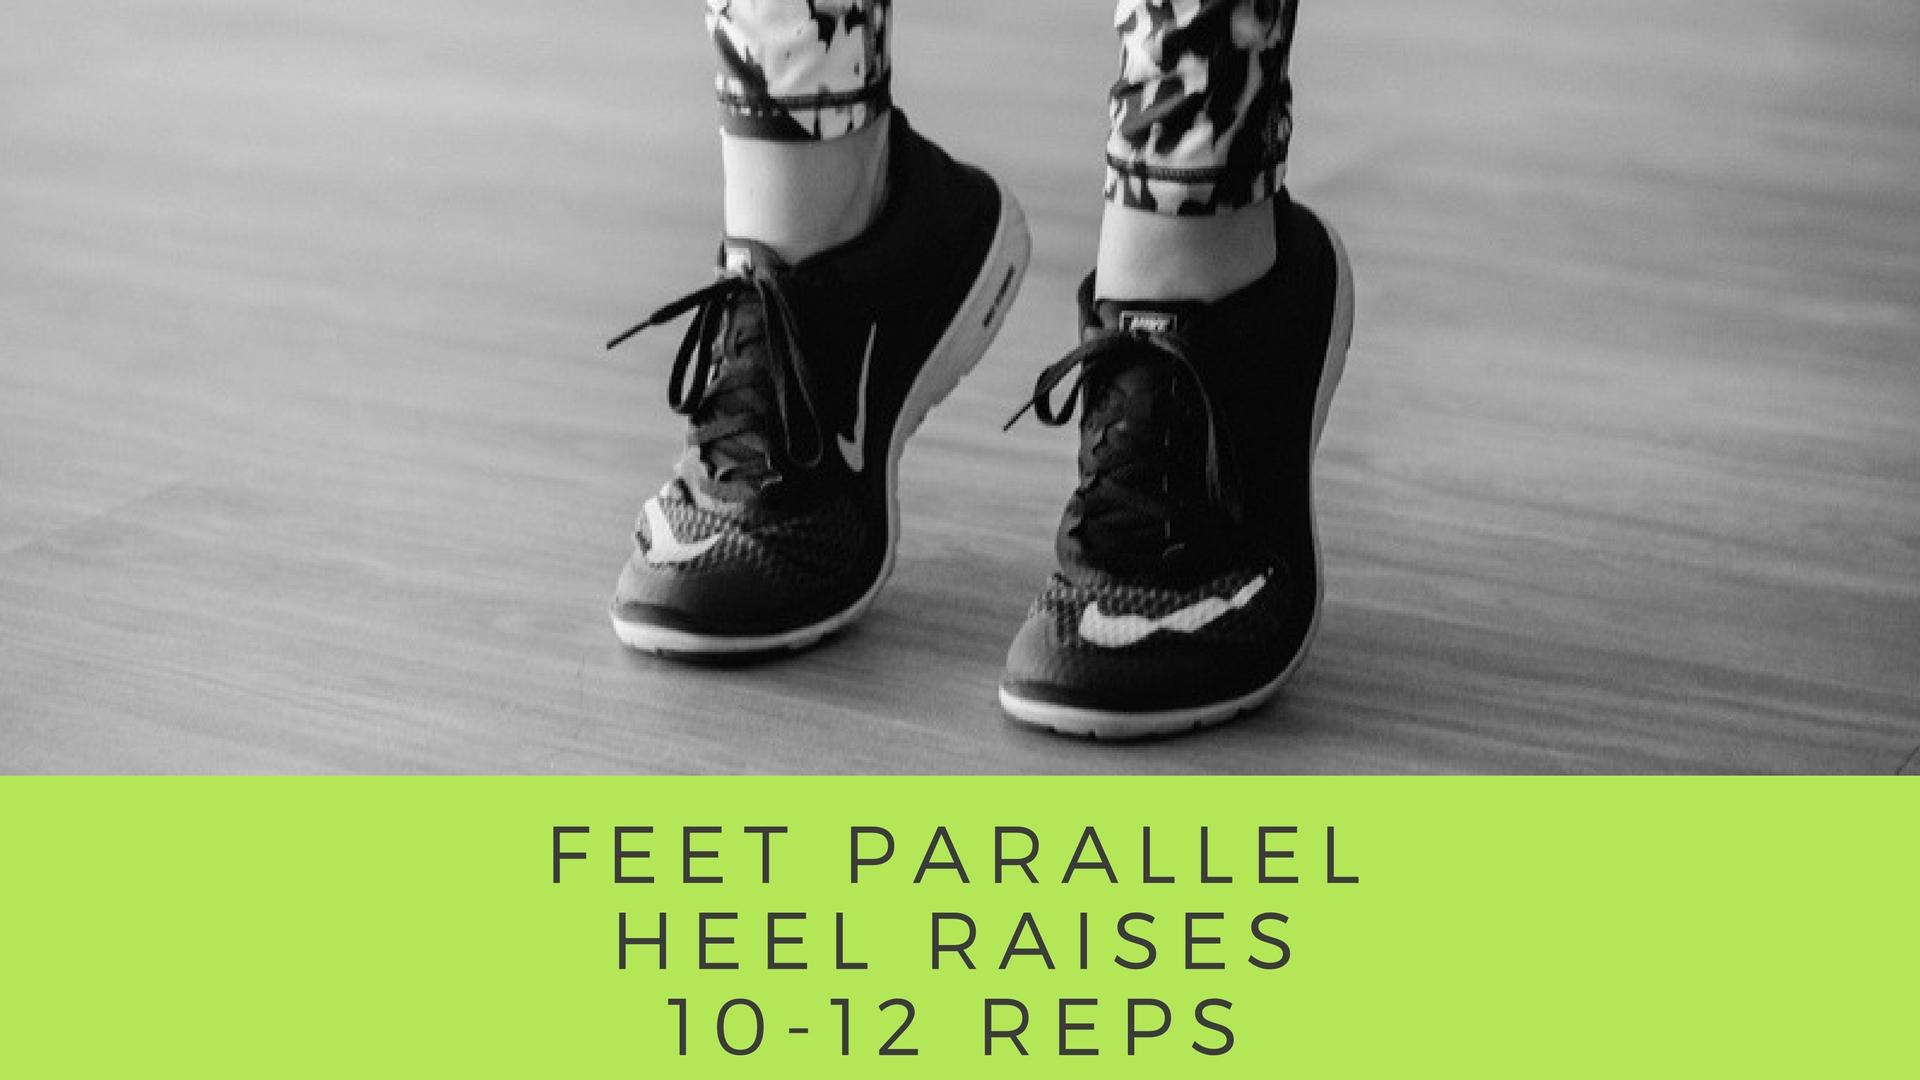 Feet Parallel / Heel Raises